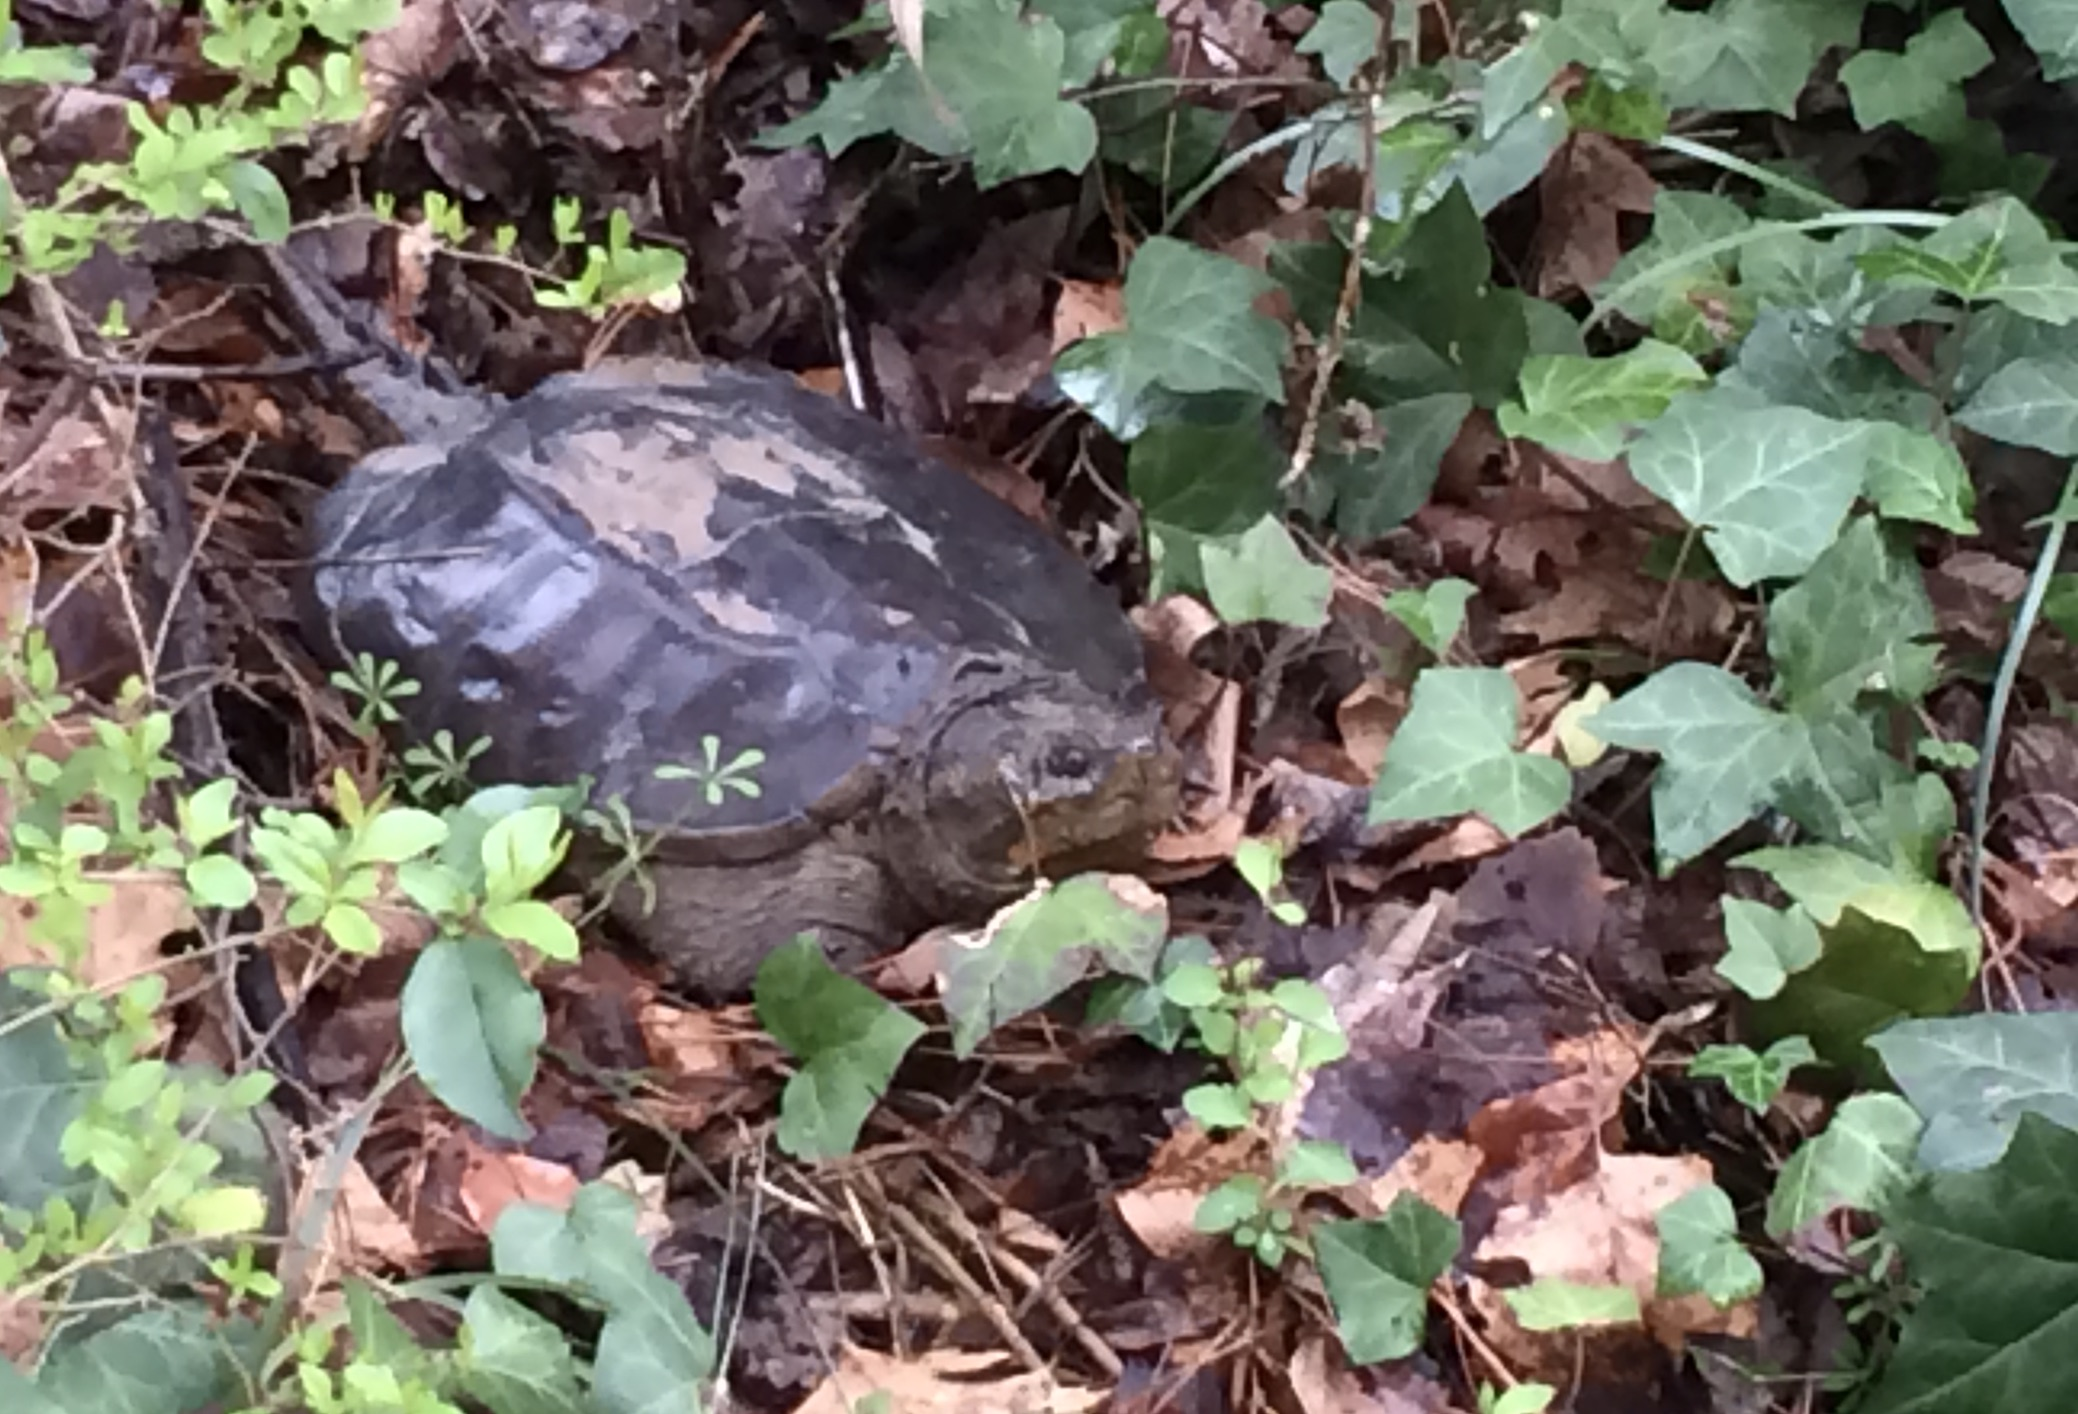 turtle, wildlife, wotus